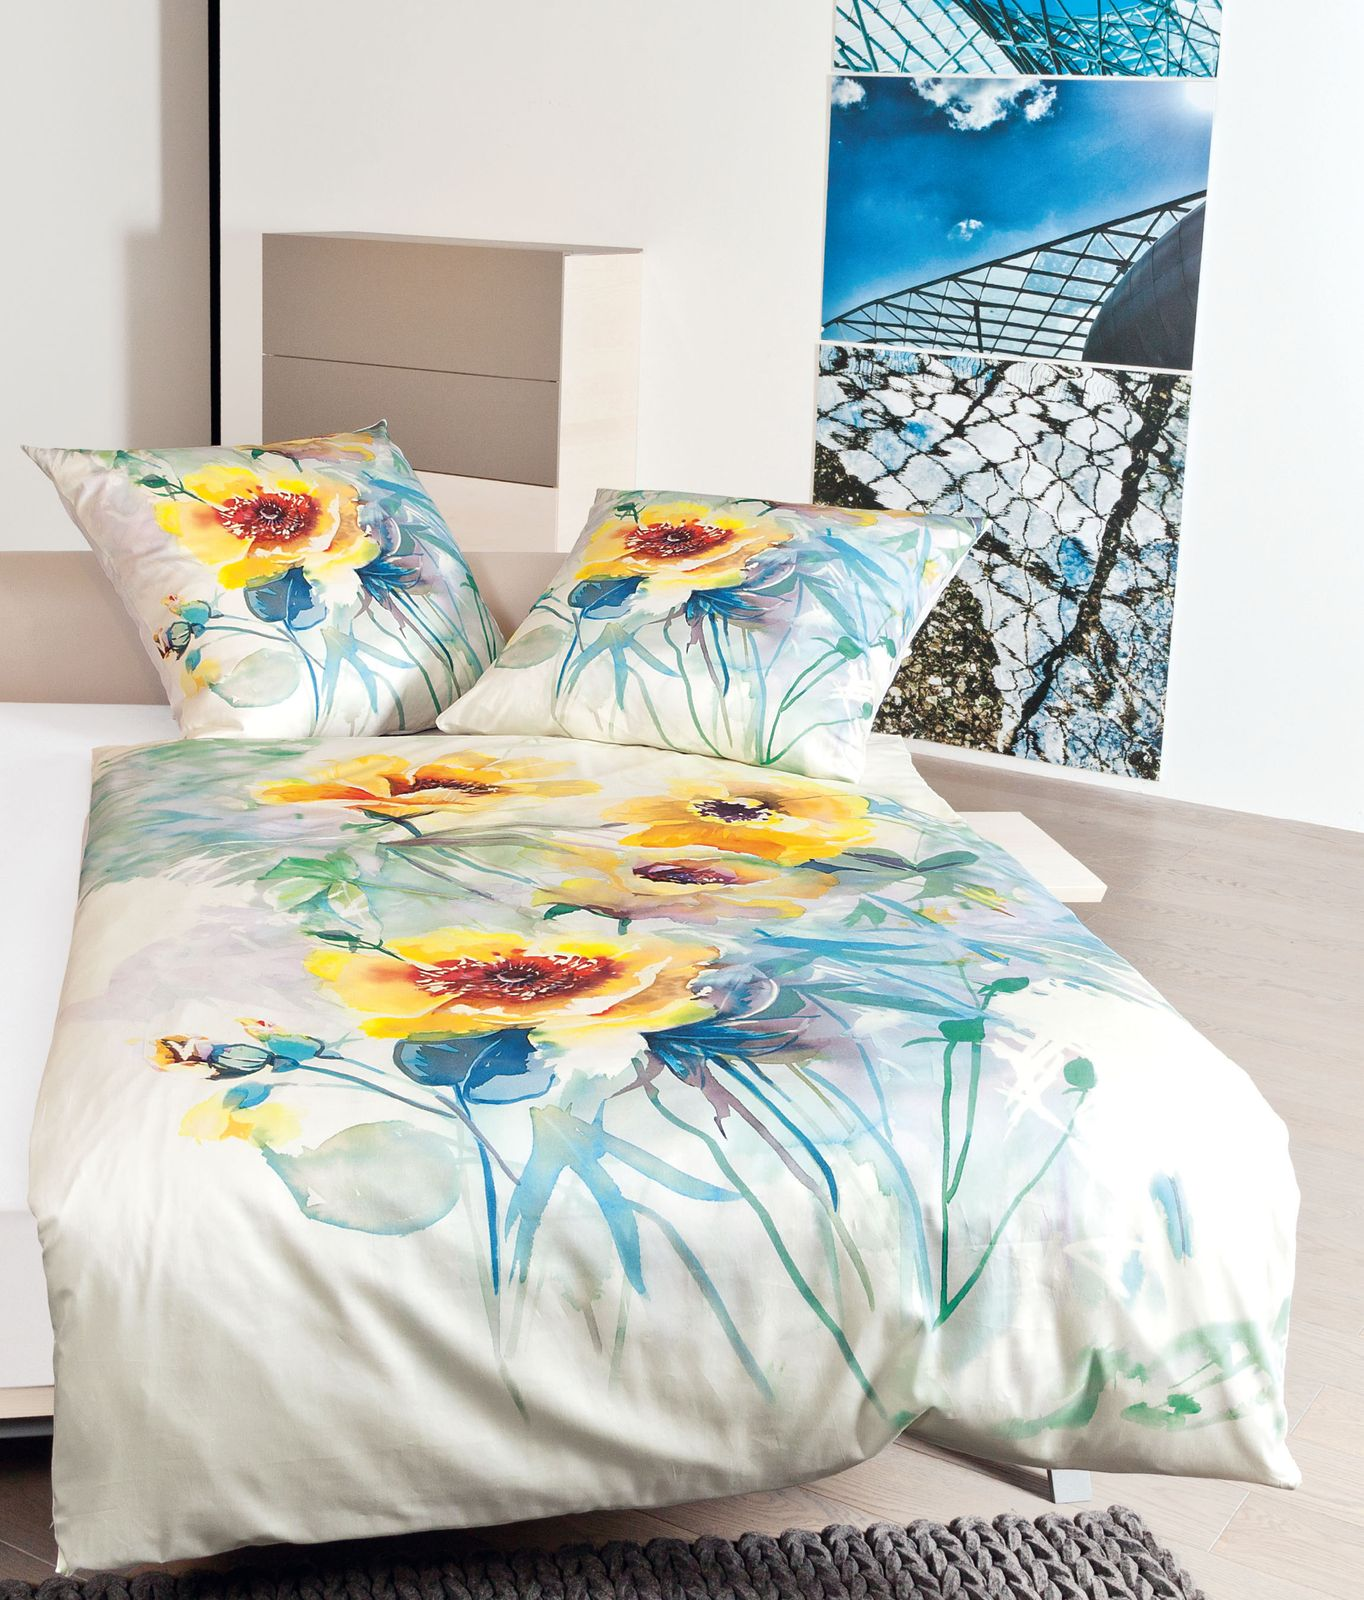 Janine Bettwäsche modern art 4131 bunt Streifen gestreift Batik glatt Mako Satin